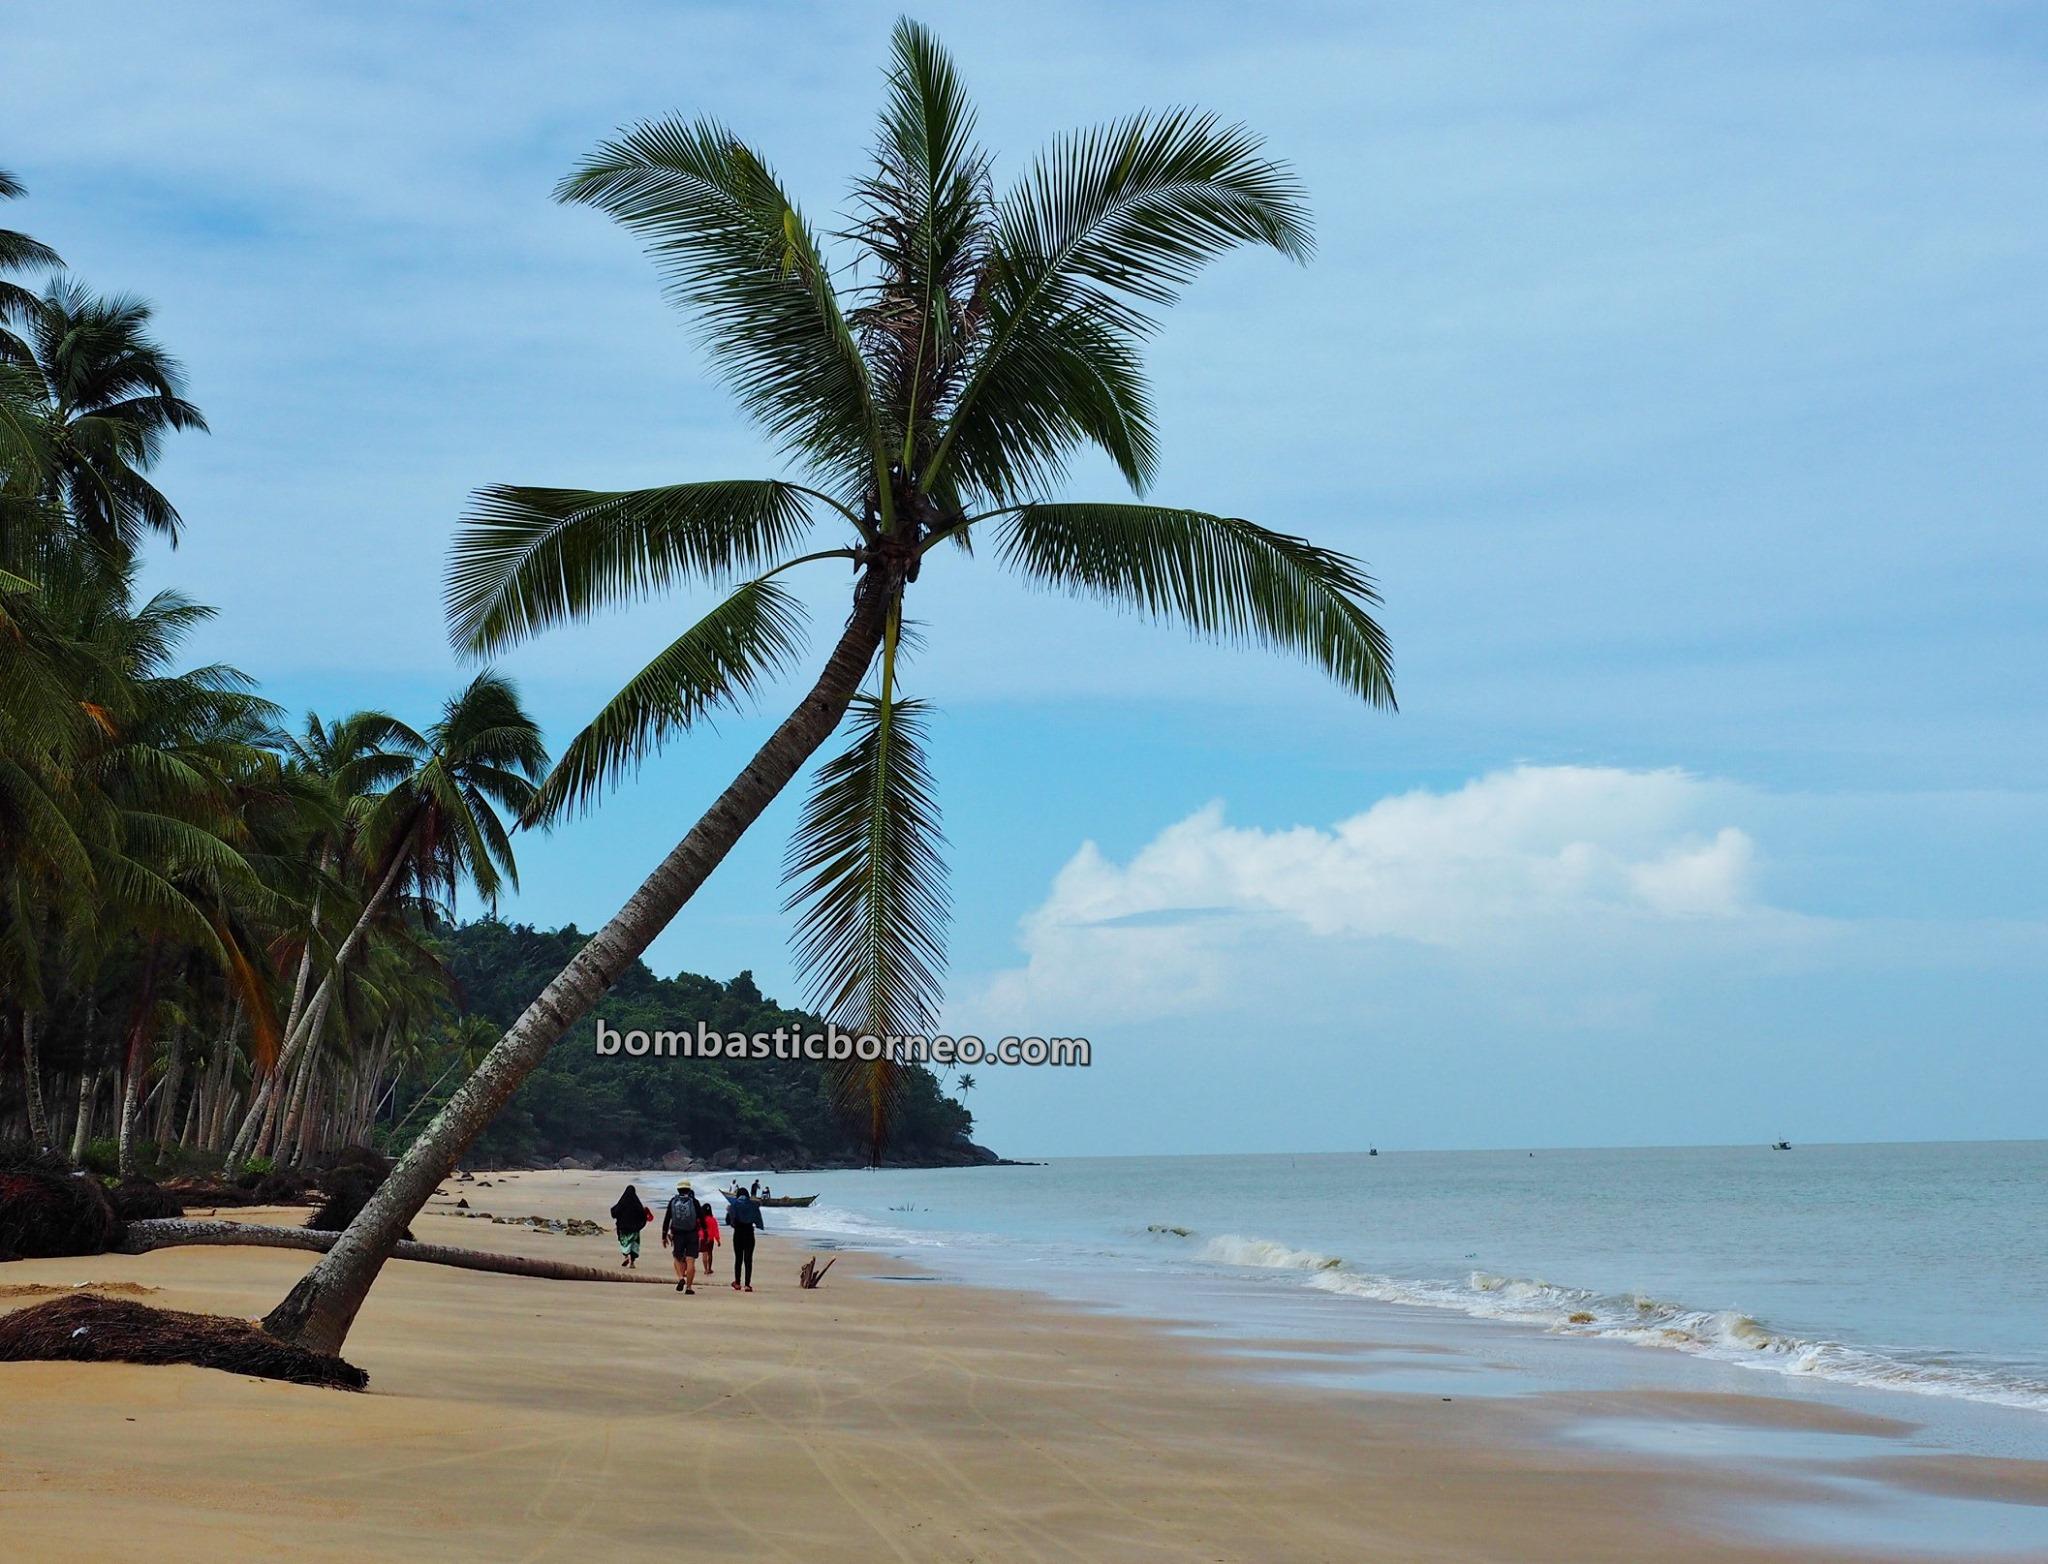 beach, adventure, nature, Malay fishing village, Kampung Melayu, Indonesia, West Kalimantan, Tourism, tourist attraction, travel guide, destination, Trans Borneo, 穿越婆罗洲游踪, 印尼西加里曼丹, 三发马来渔村